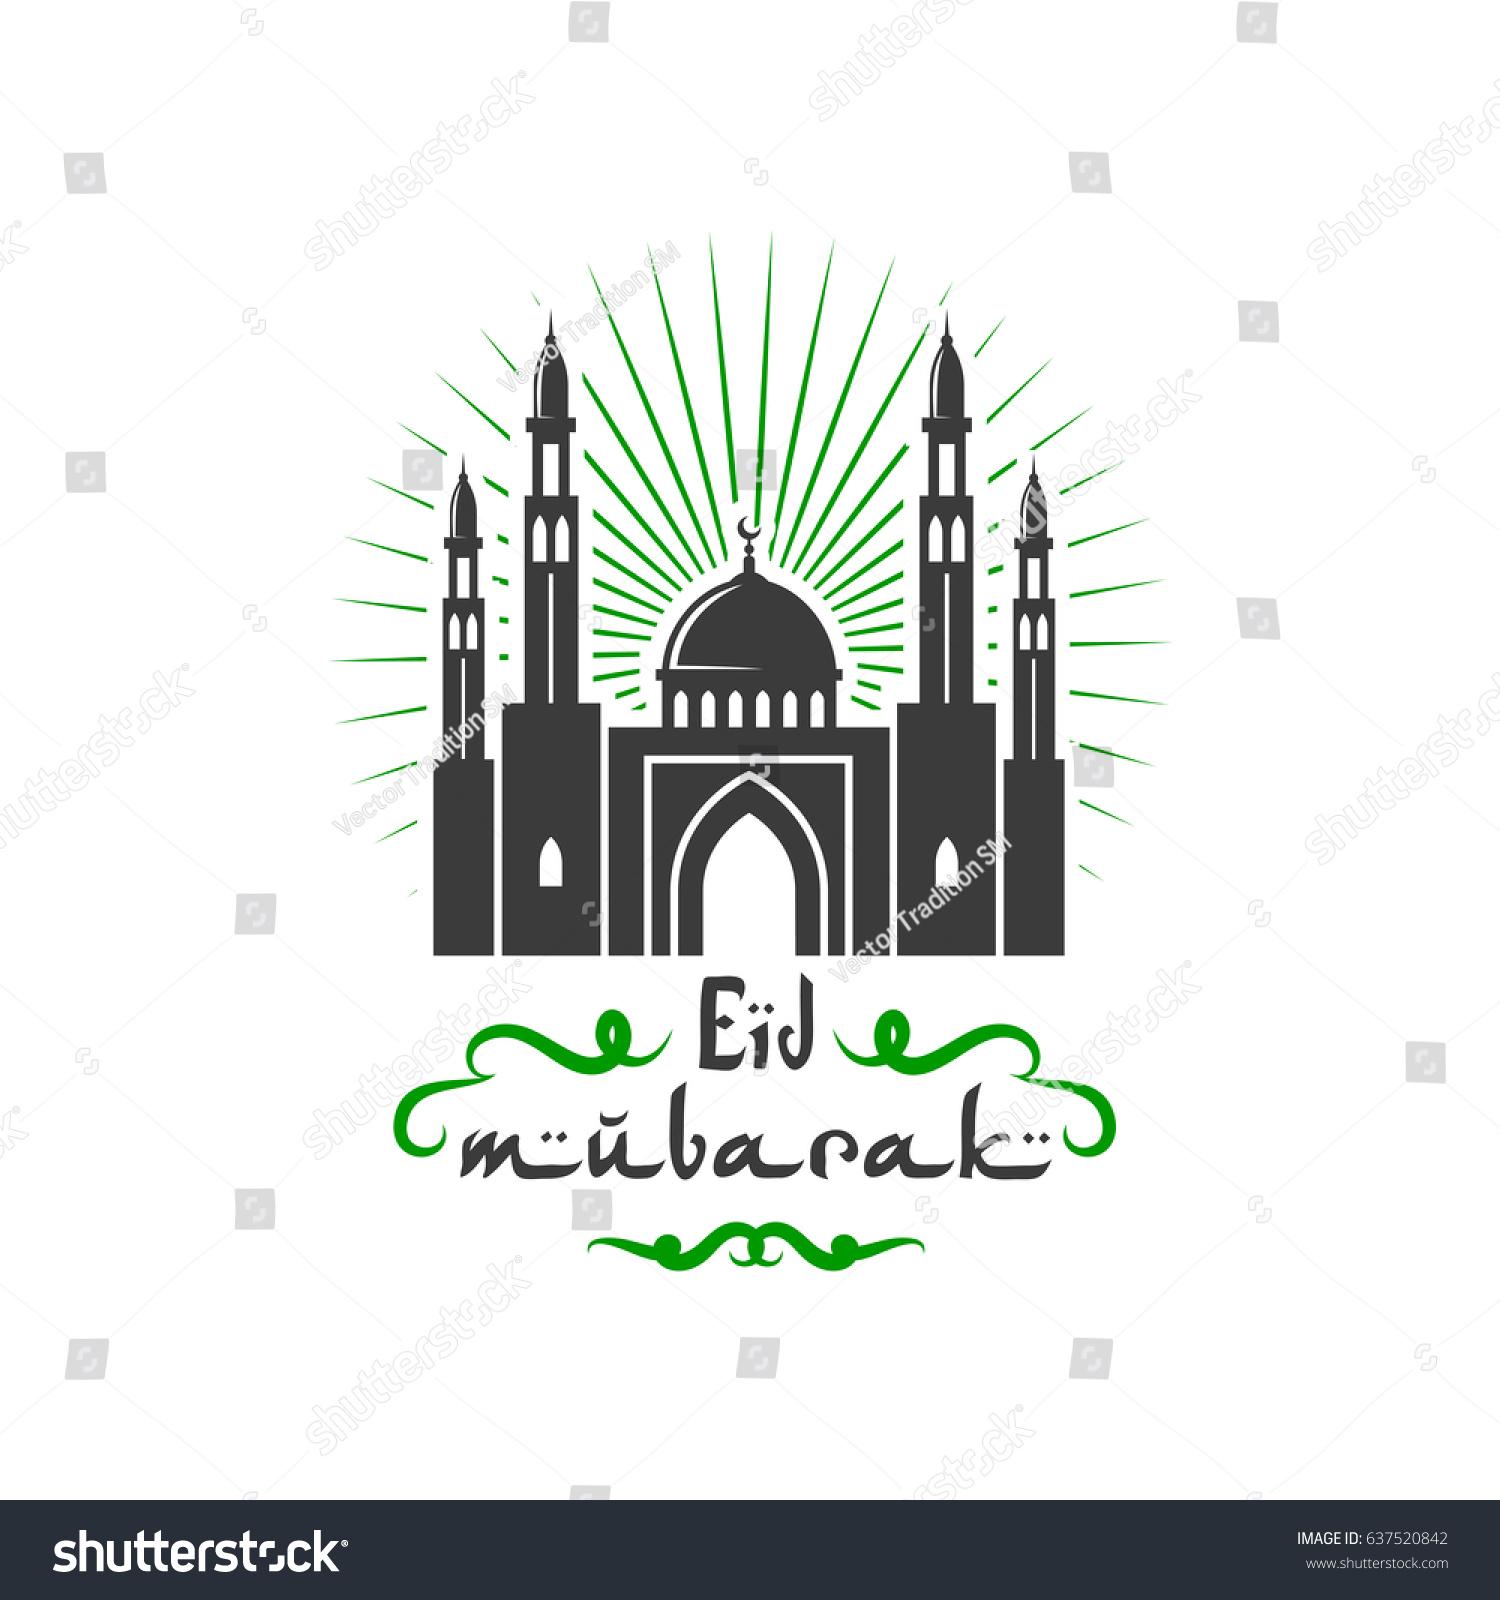 Eid Mubarak Greeting Design Traditional Muslim Stock Vector Royalty